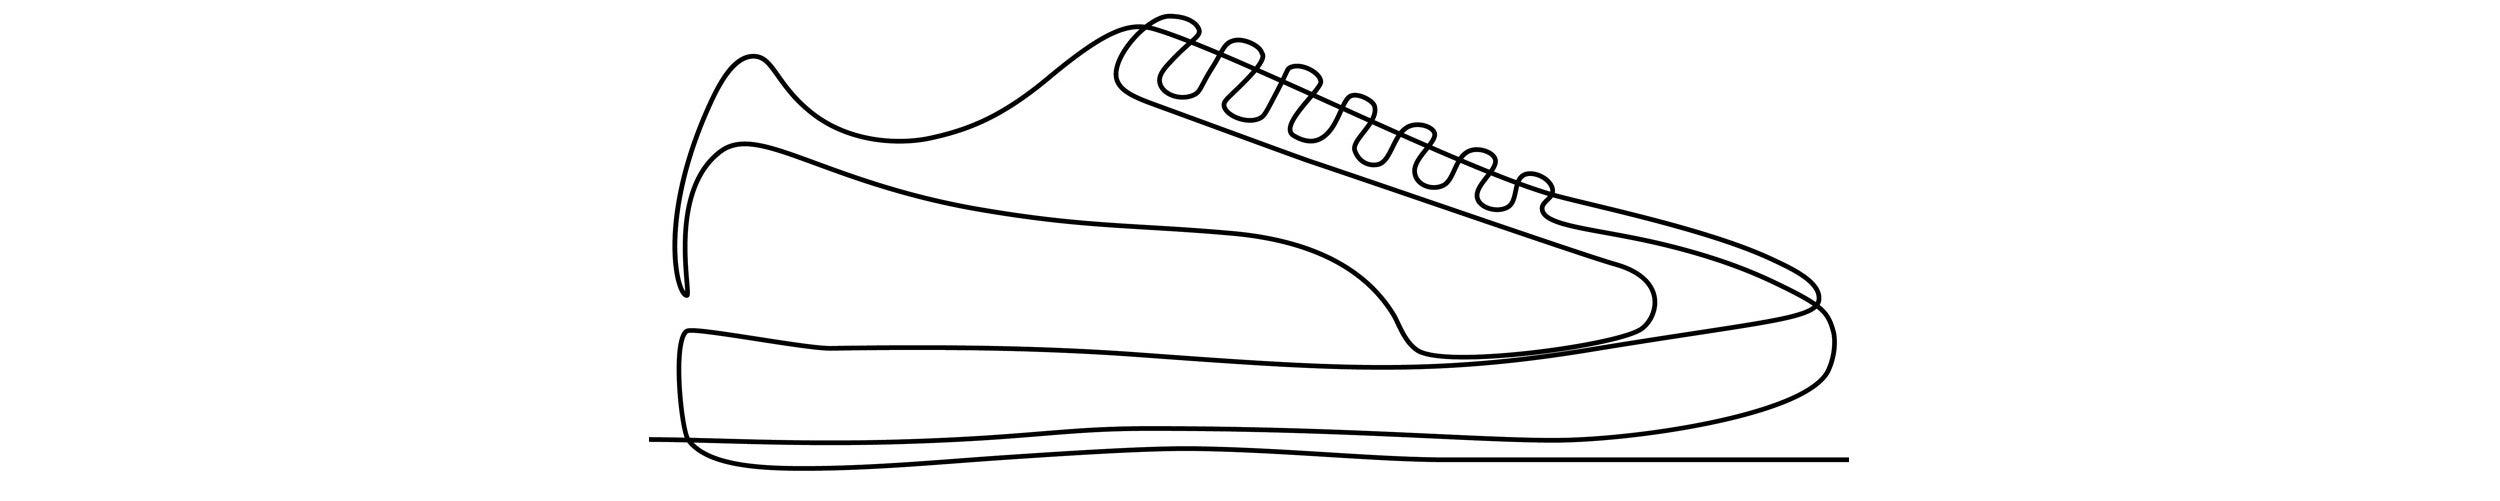 Sketch of sneaker.